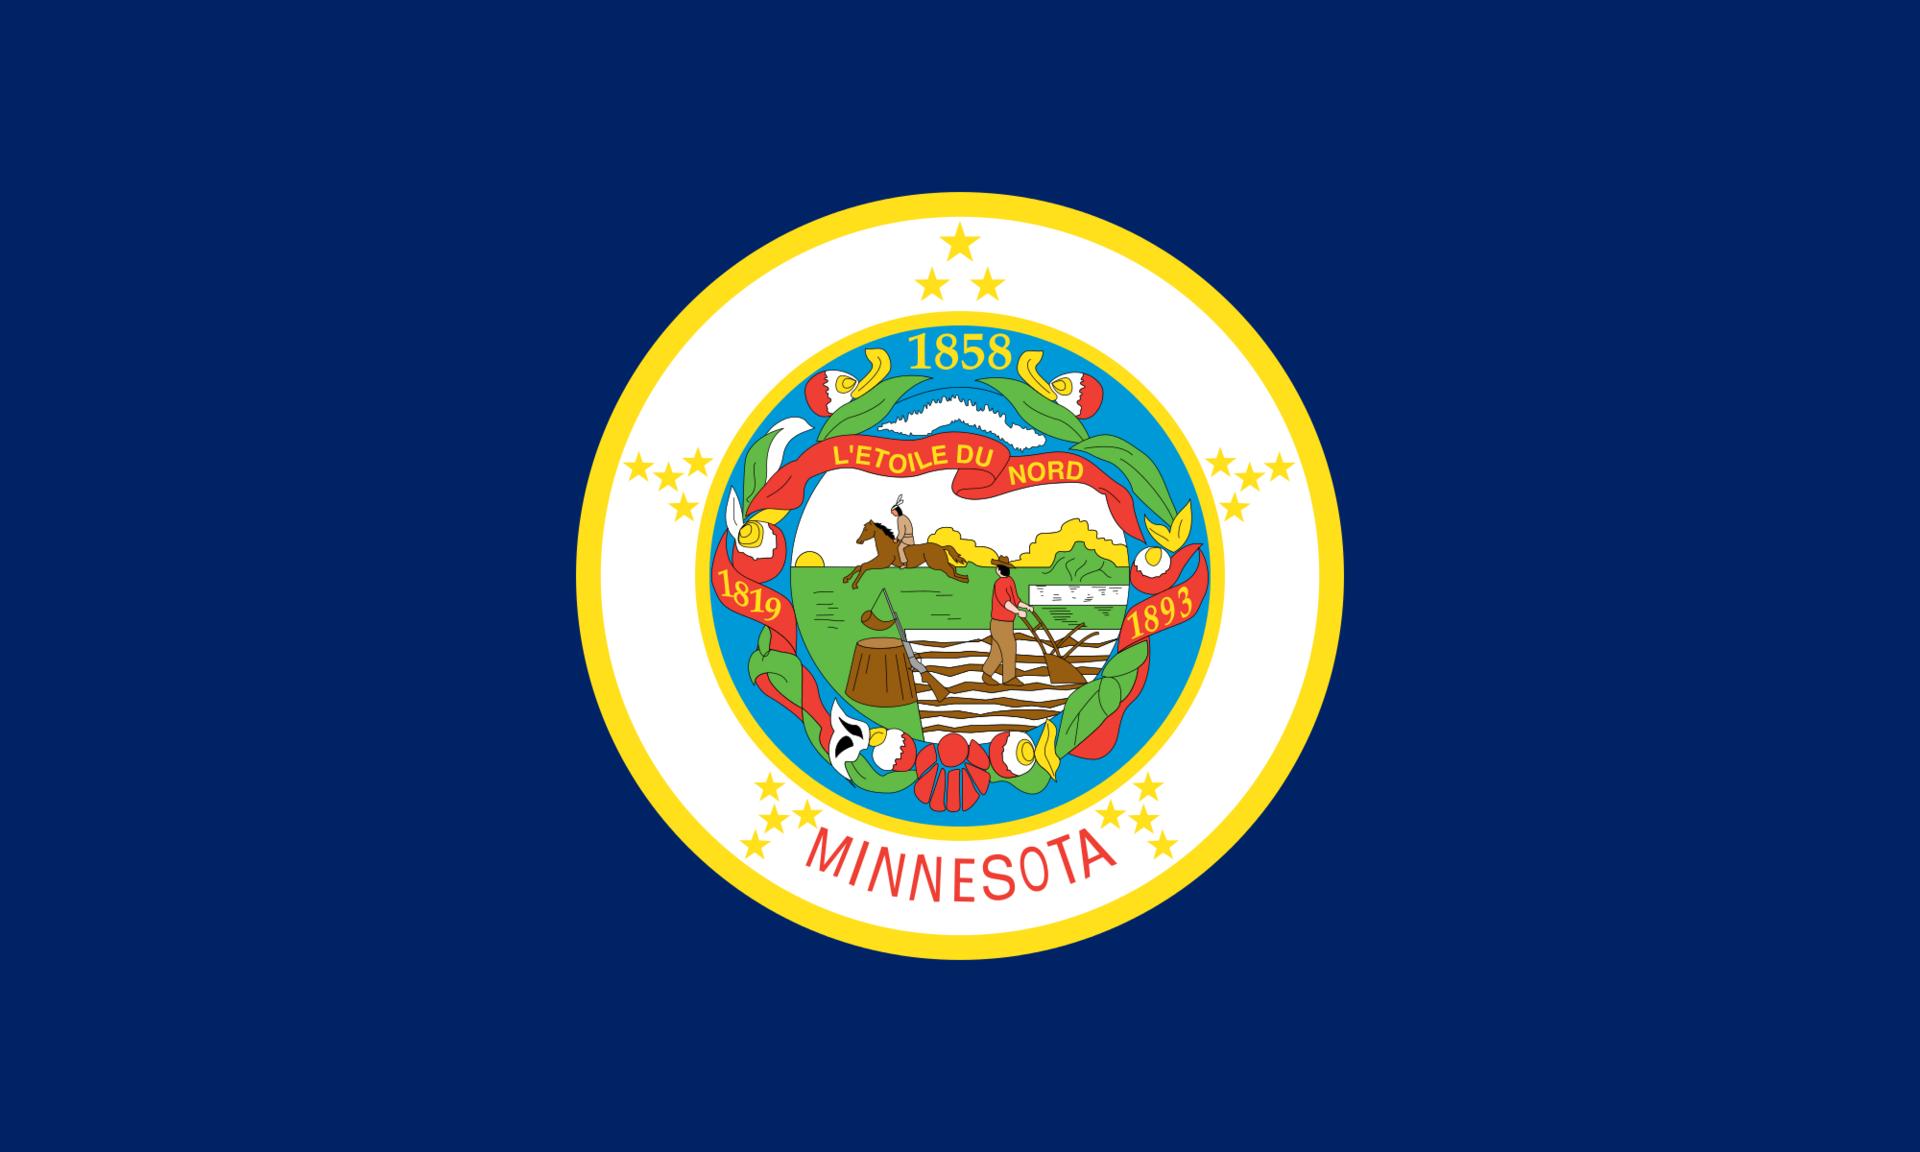 Bandiera Del Minnesota Wikipedia